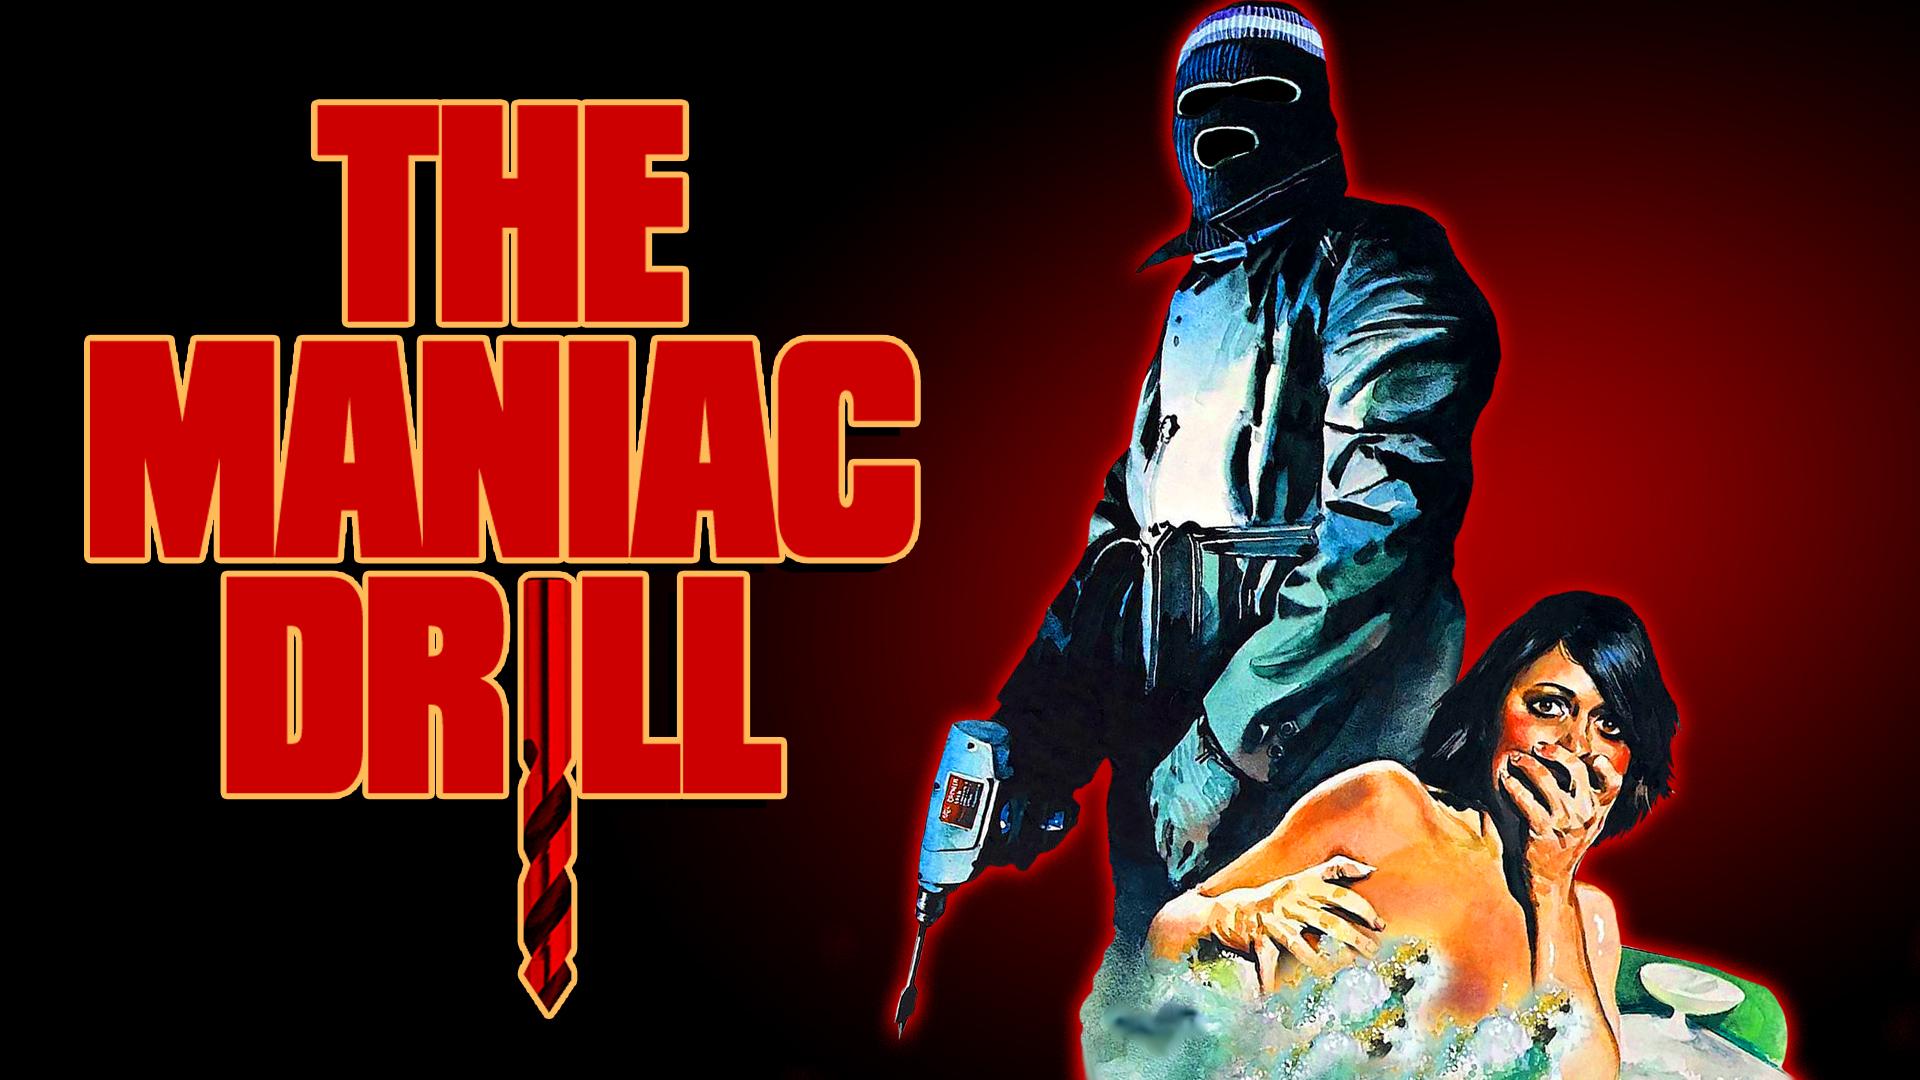 The Maniac Drill